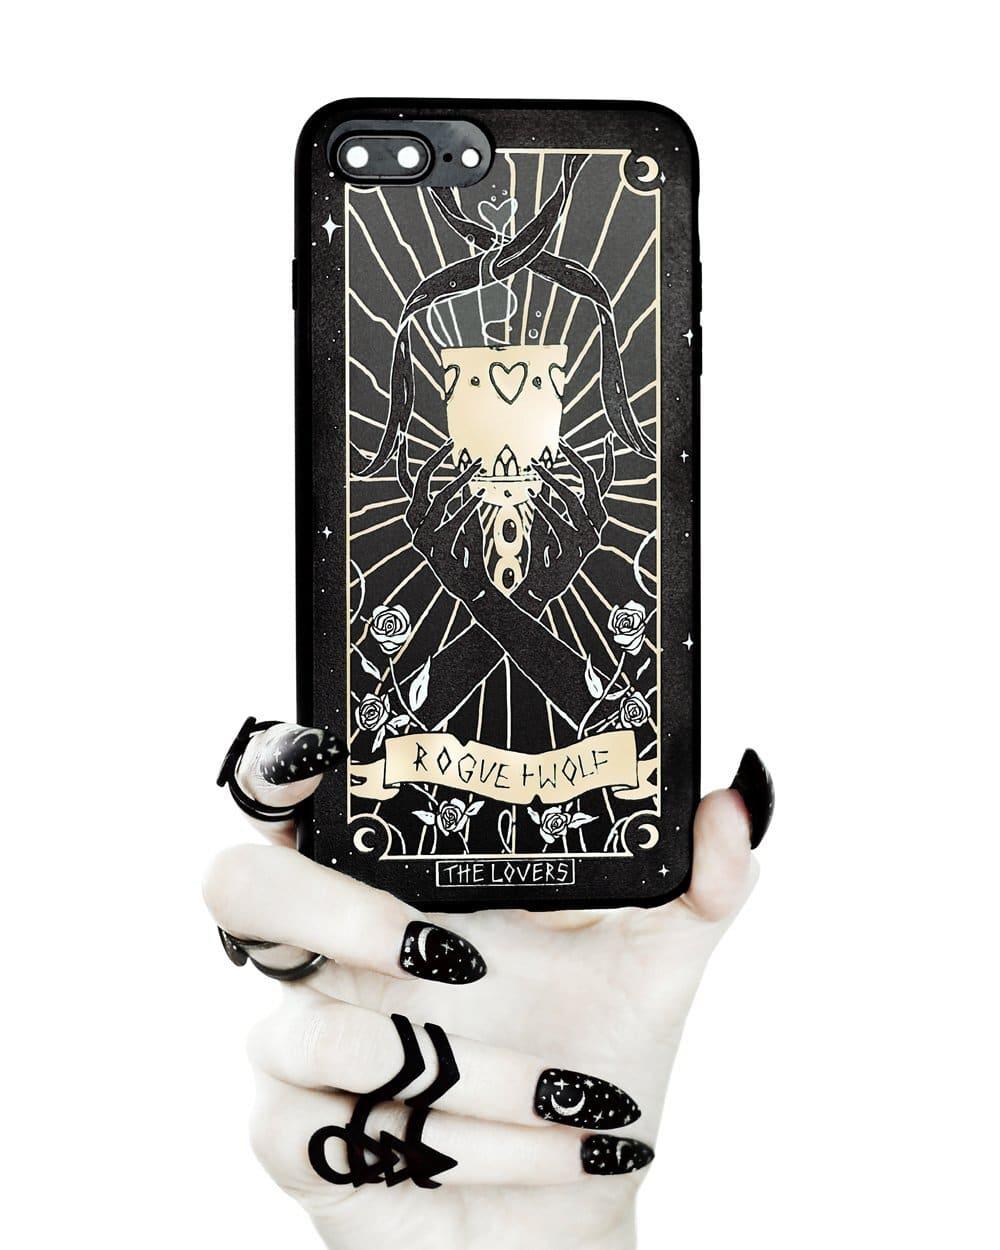 The Lovers Tarot Phone Case